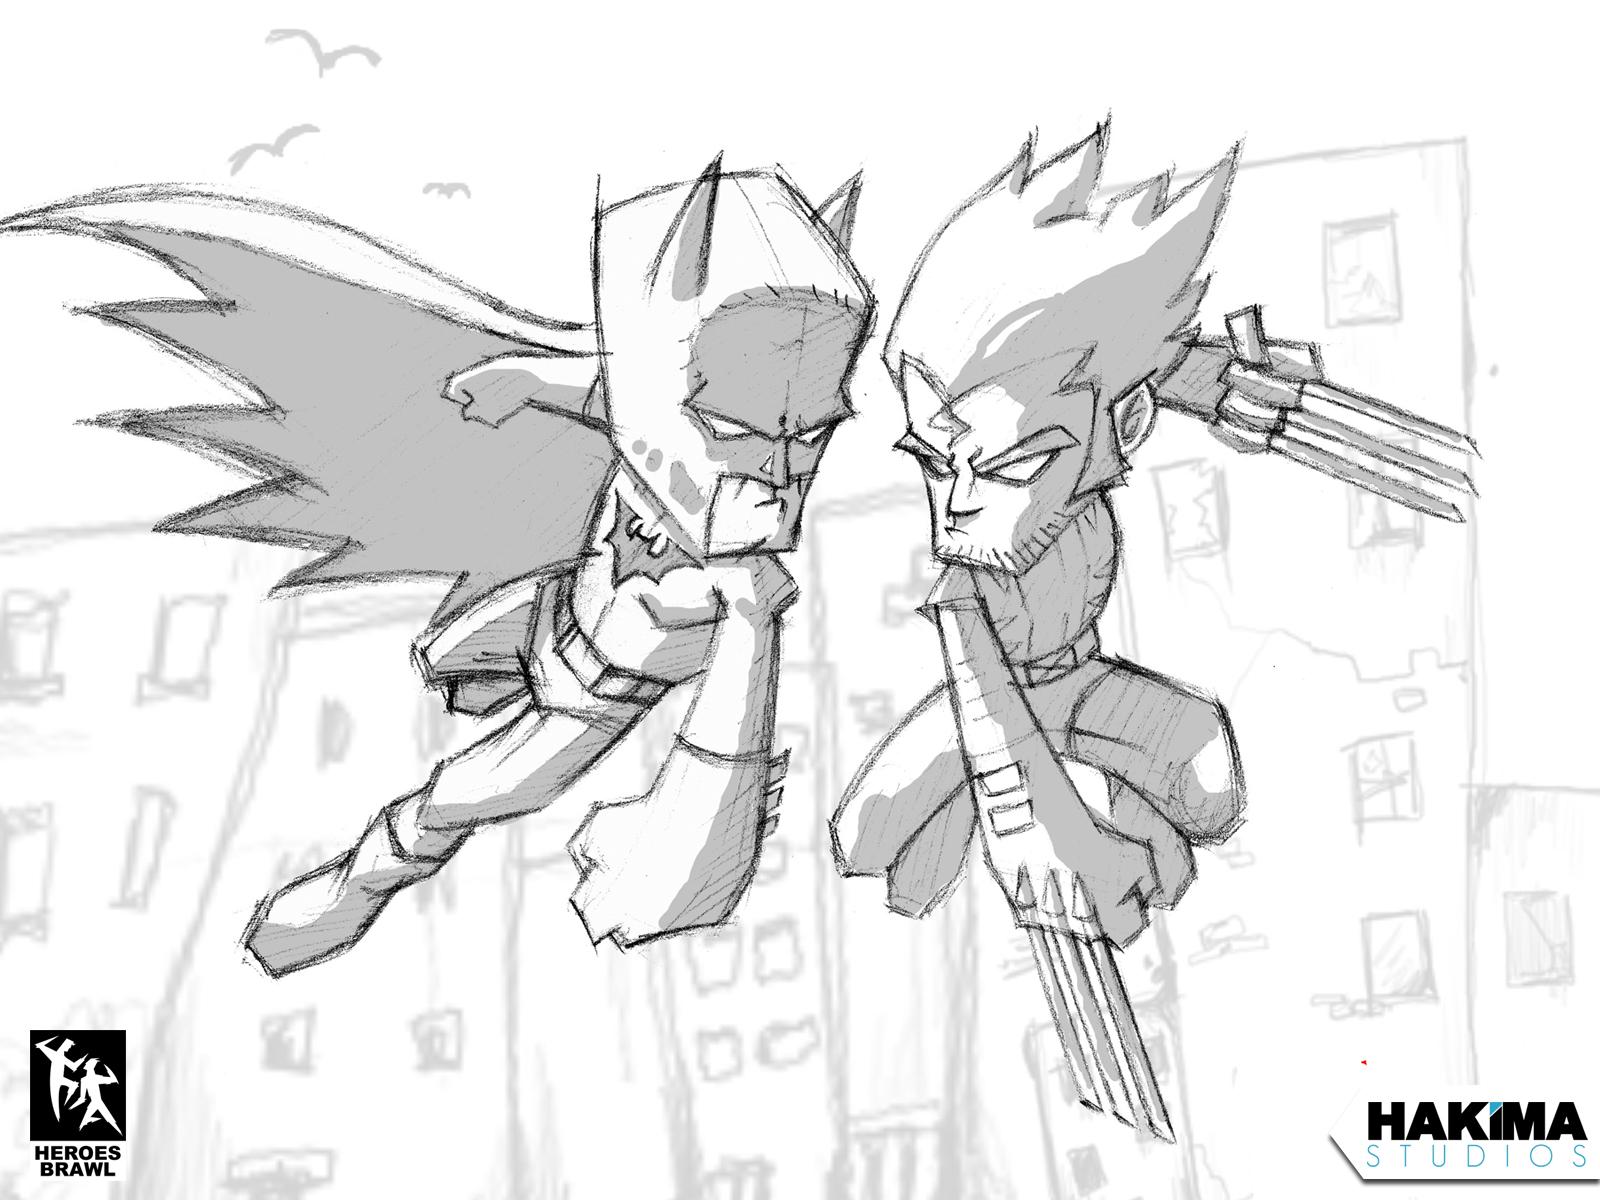 Batman Vs Wolverine Wallpaper 1600 X 1200 Version 3 Hakima Studios